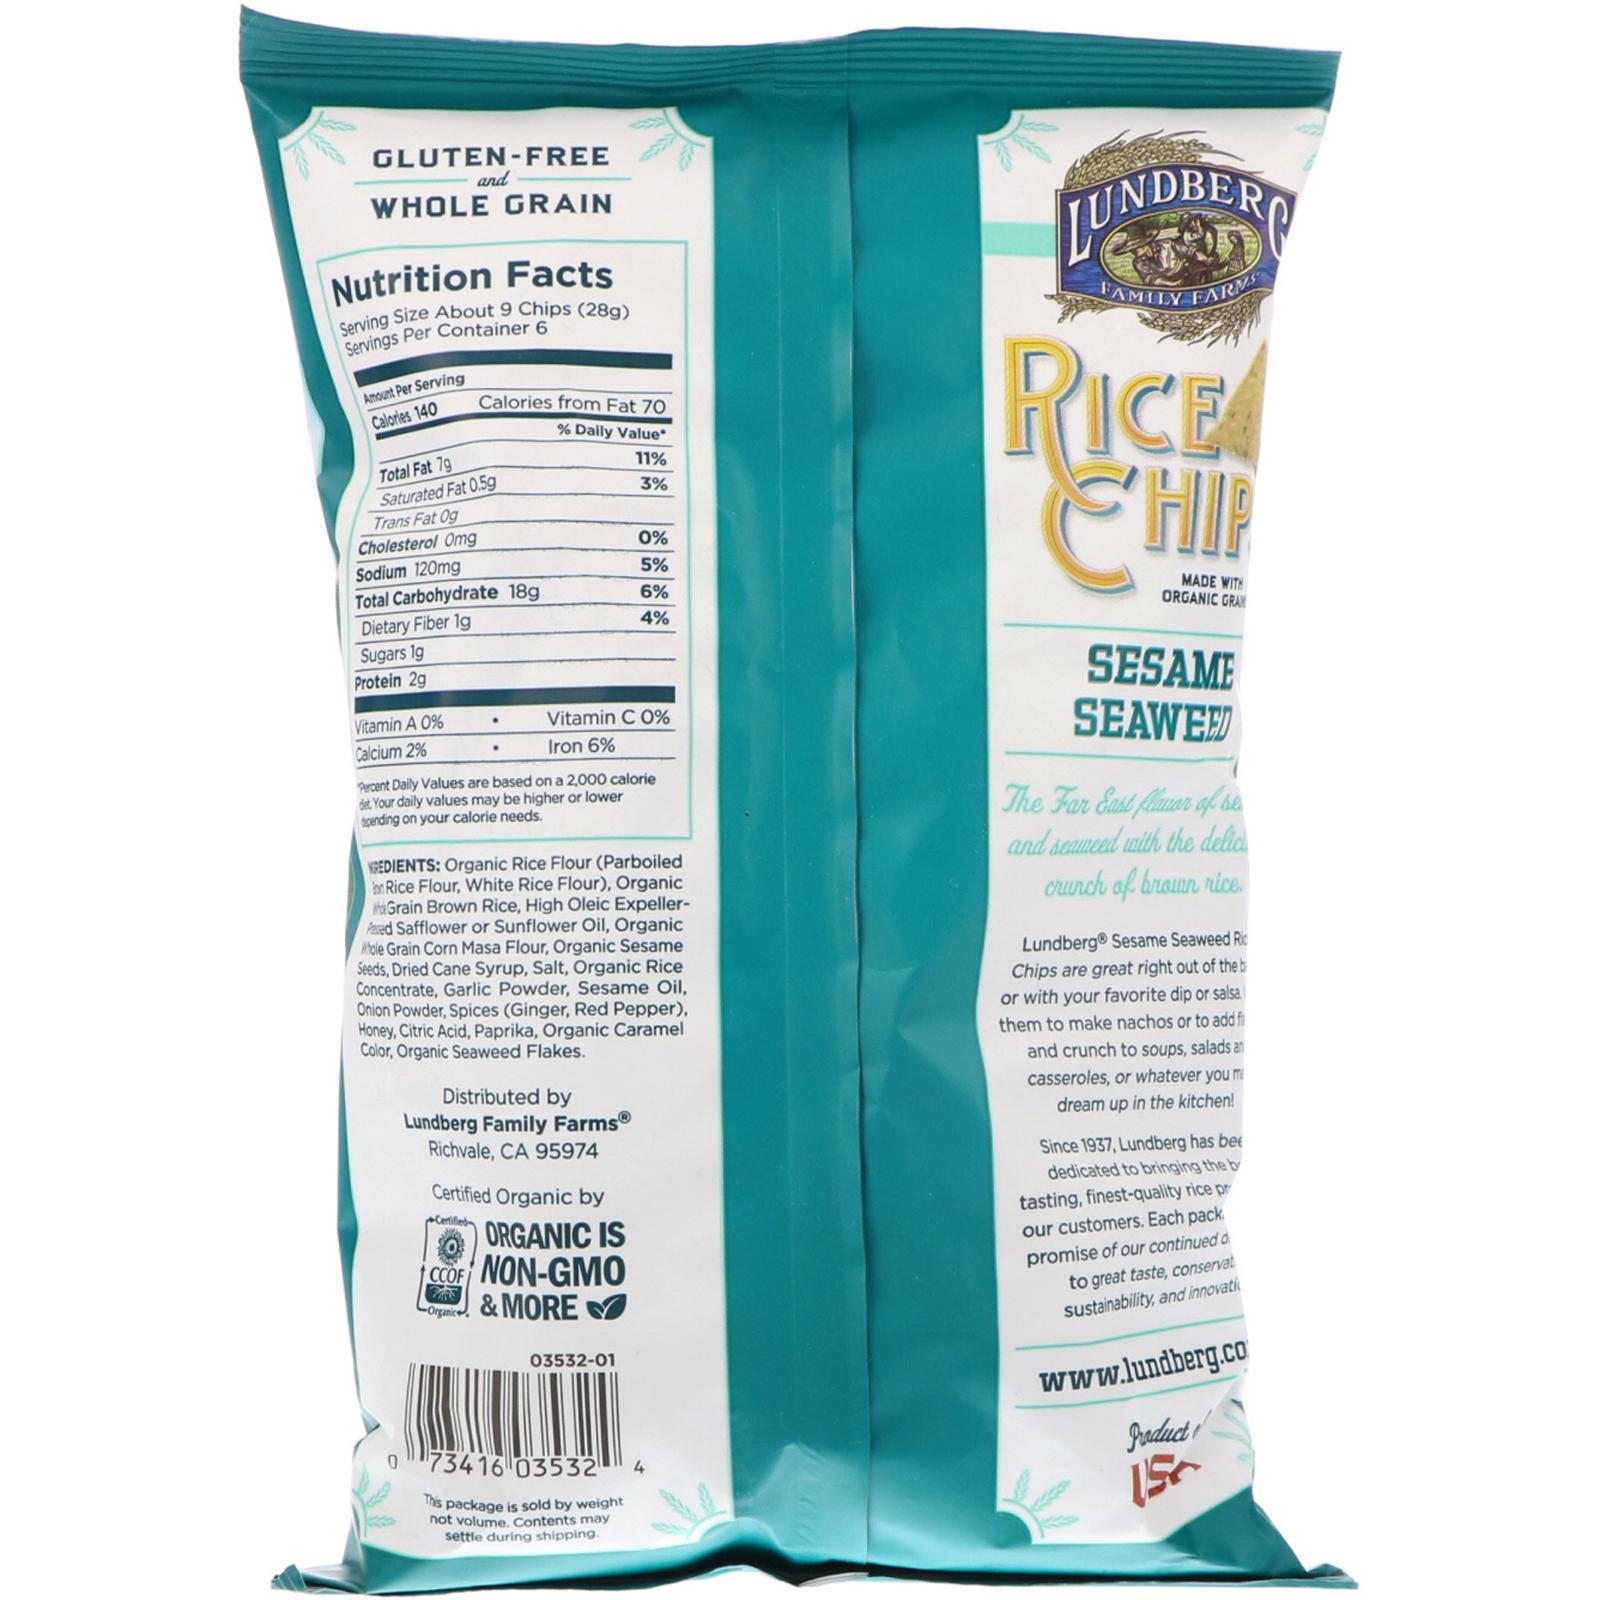 Lundberg, Rice Chips, Sesame & Seaweed, 6 oz (170 g) - iHerb.com